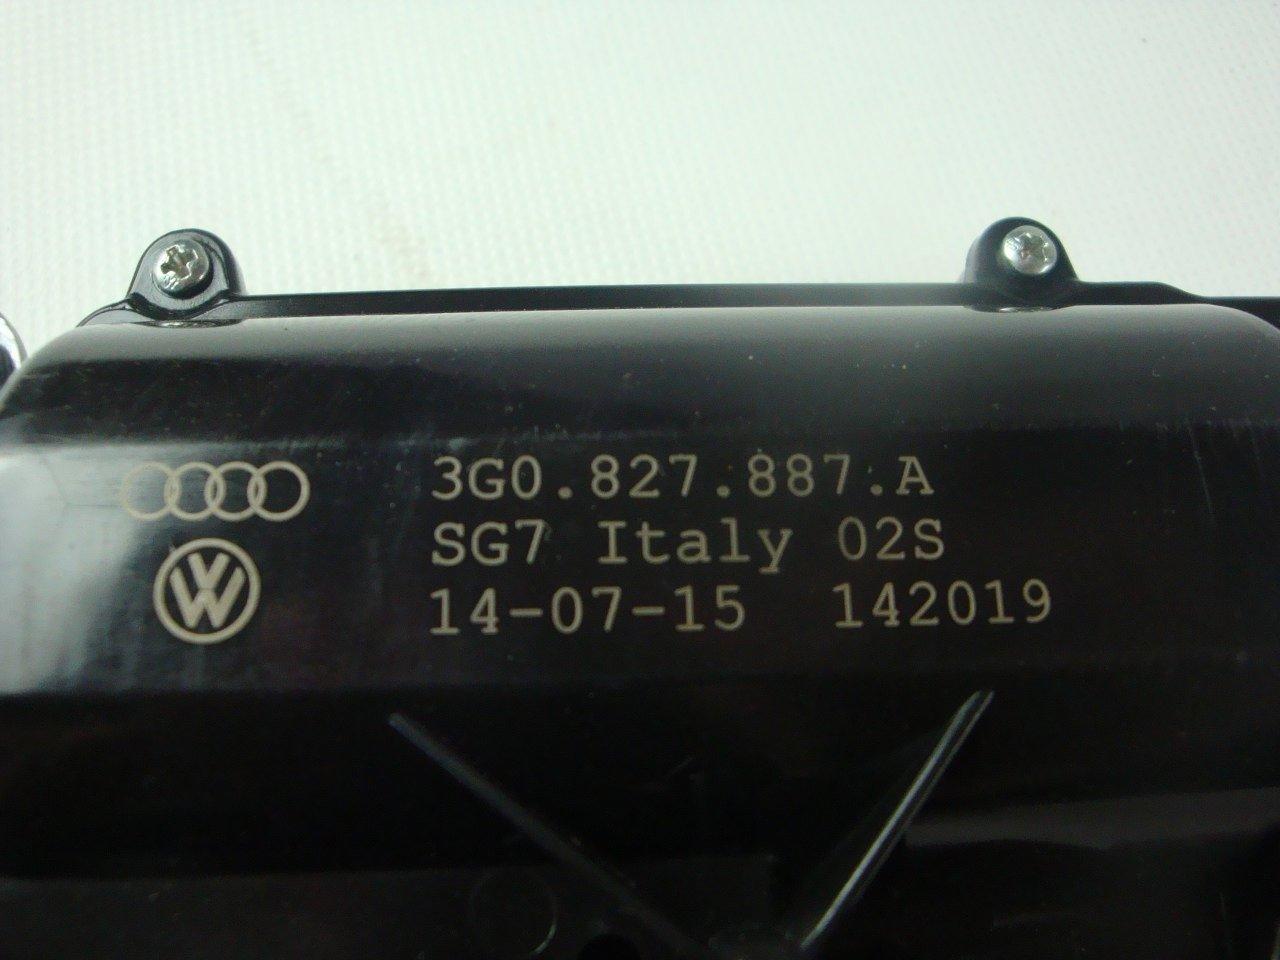 SERVOMOTOR ELEKTRISCHE HECKKLAPPE ZUZIEHHILFE VW TIGUAN II 2016 ...